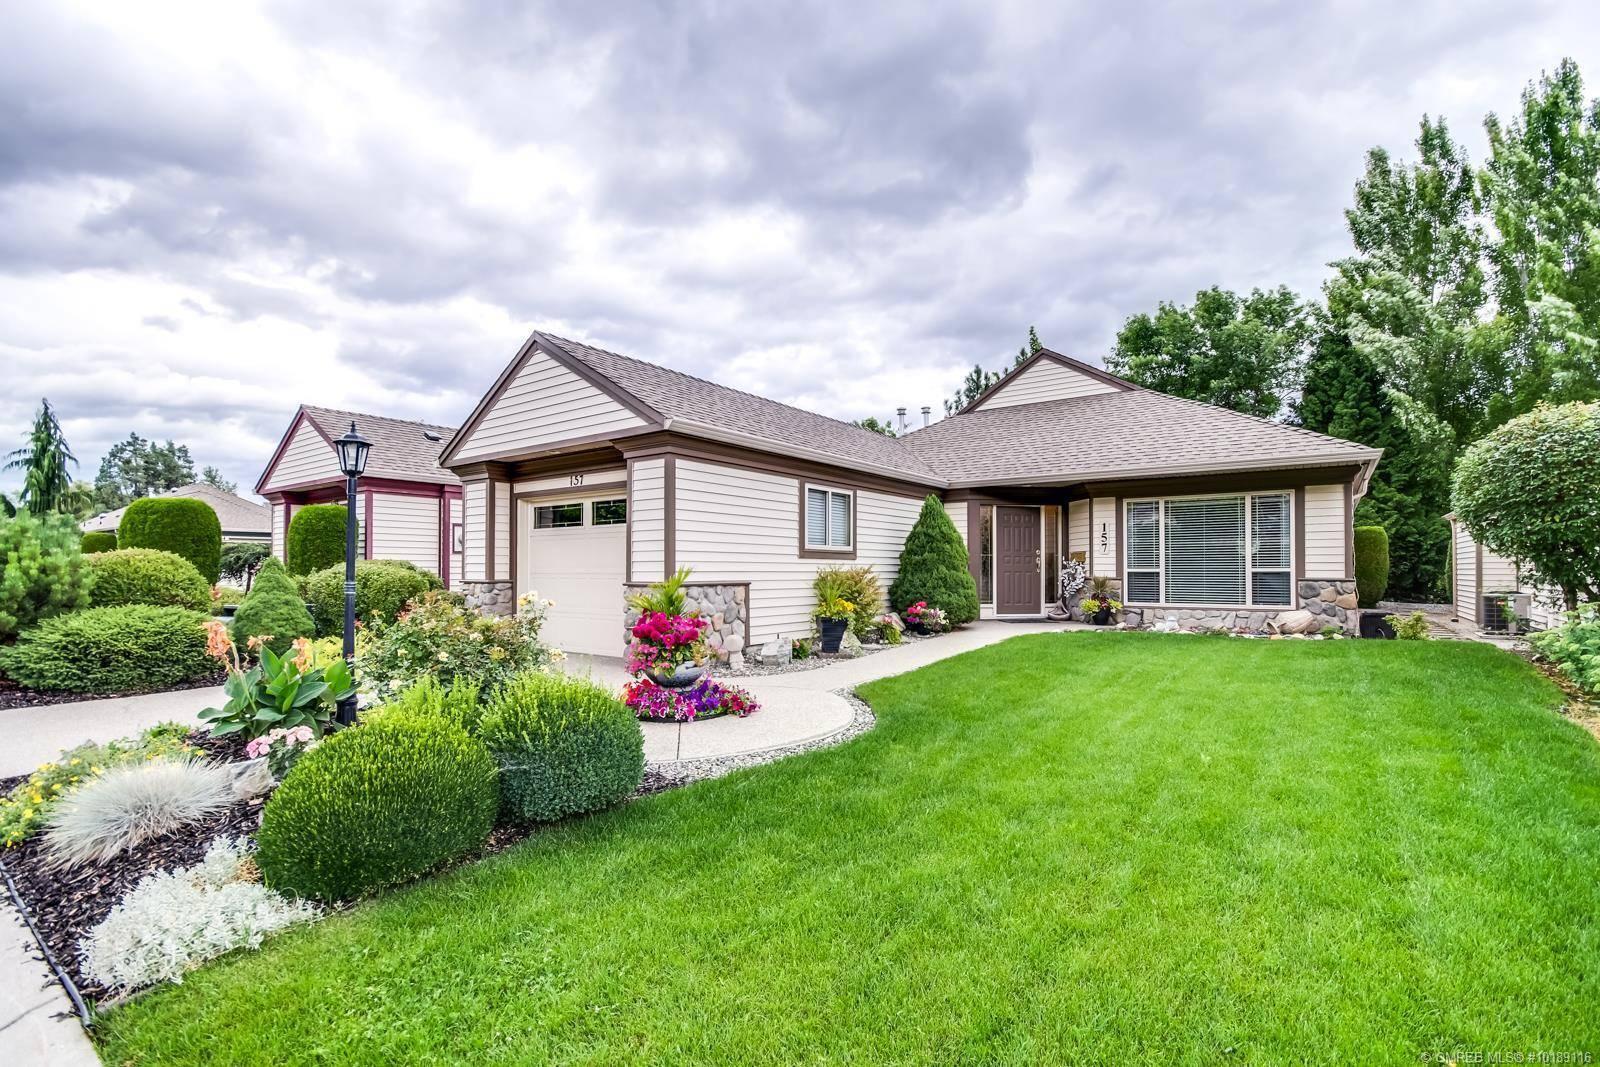 House for sale at 550 Yates Rd Unit 157 Kelowna British Columbia - MLS: 10189116